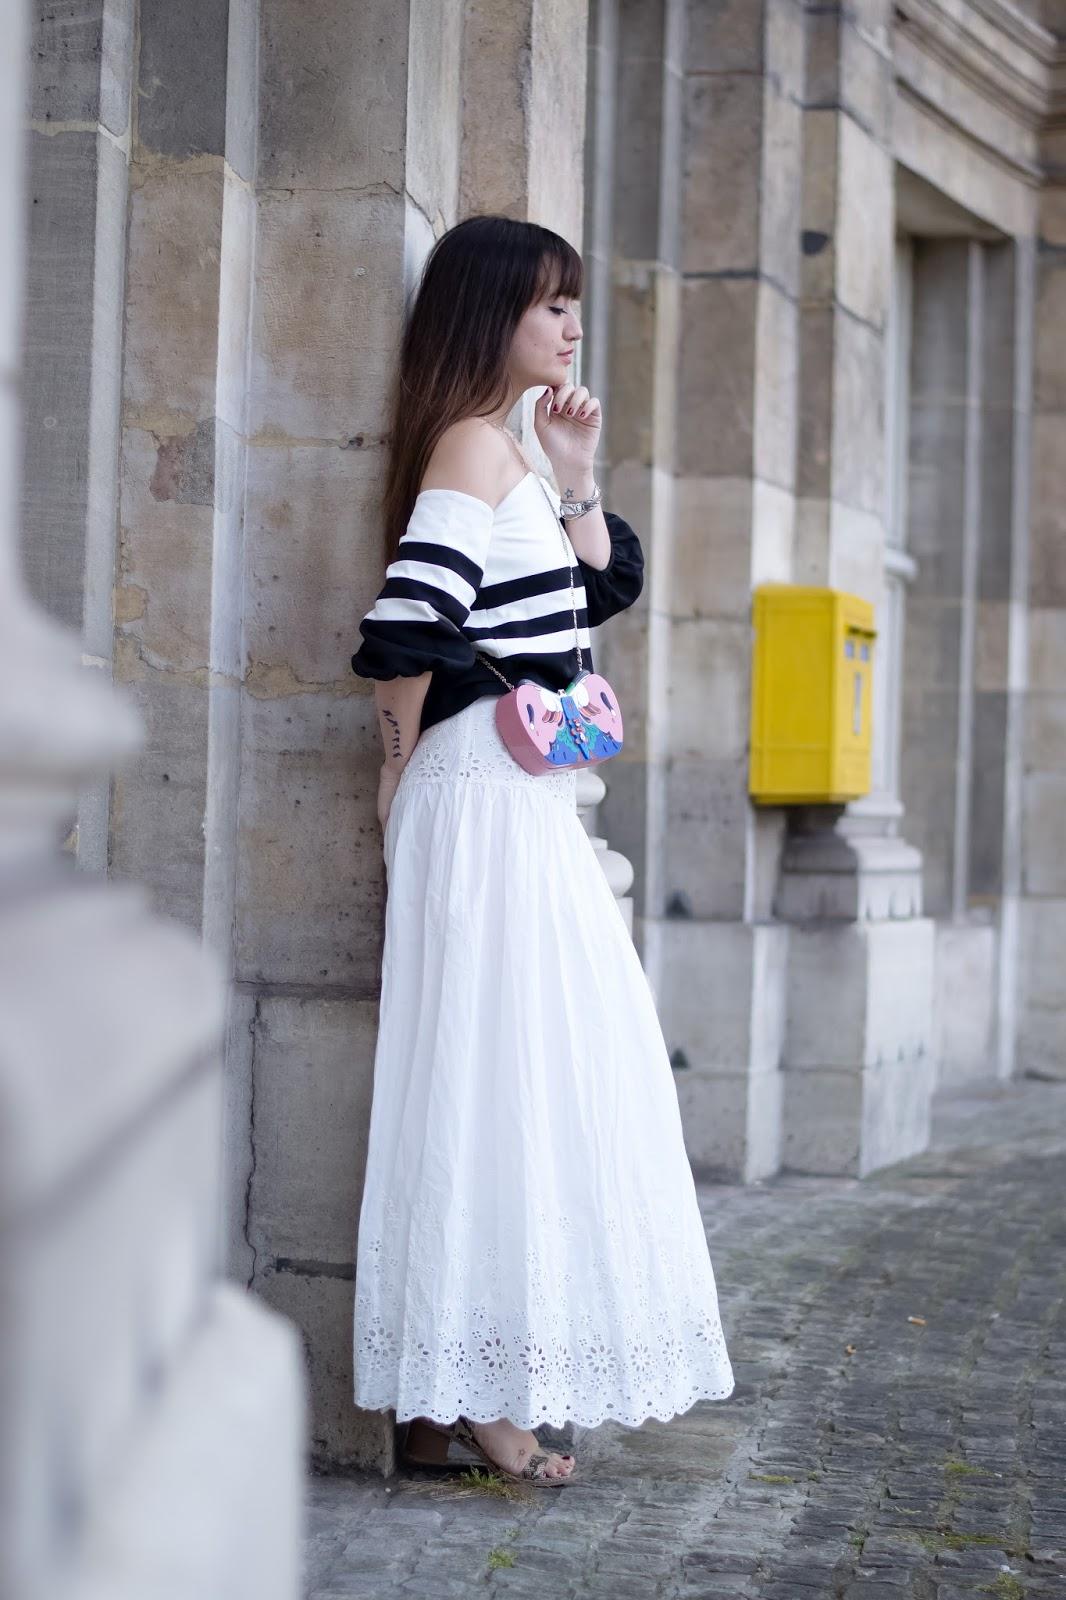 meetmeinparee, blogger, fashion, look, paris, style, chic, street style, shiatzy Chen